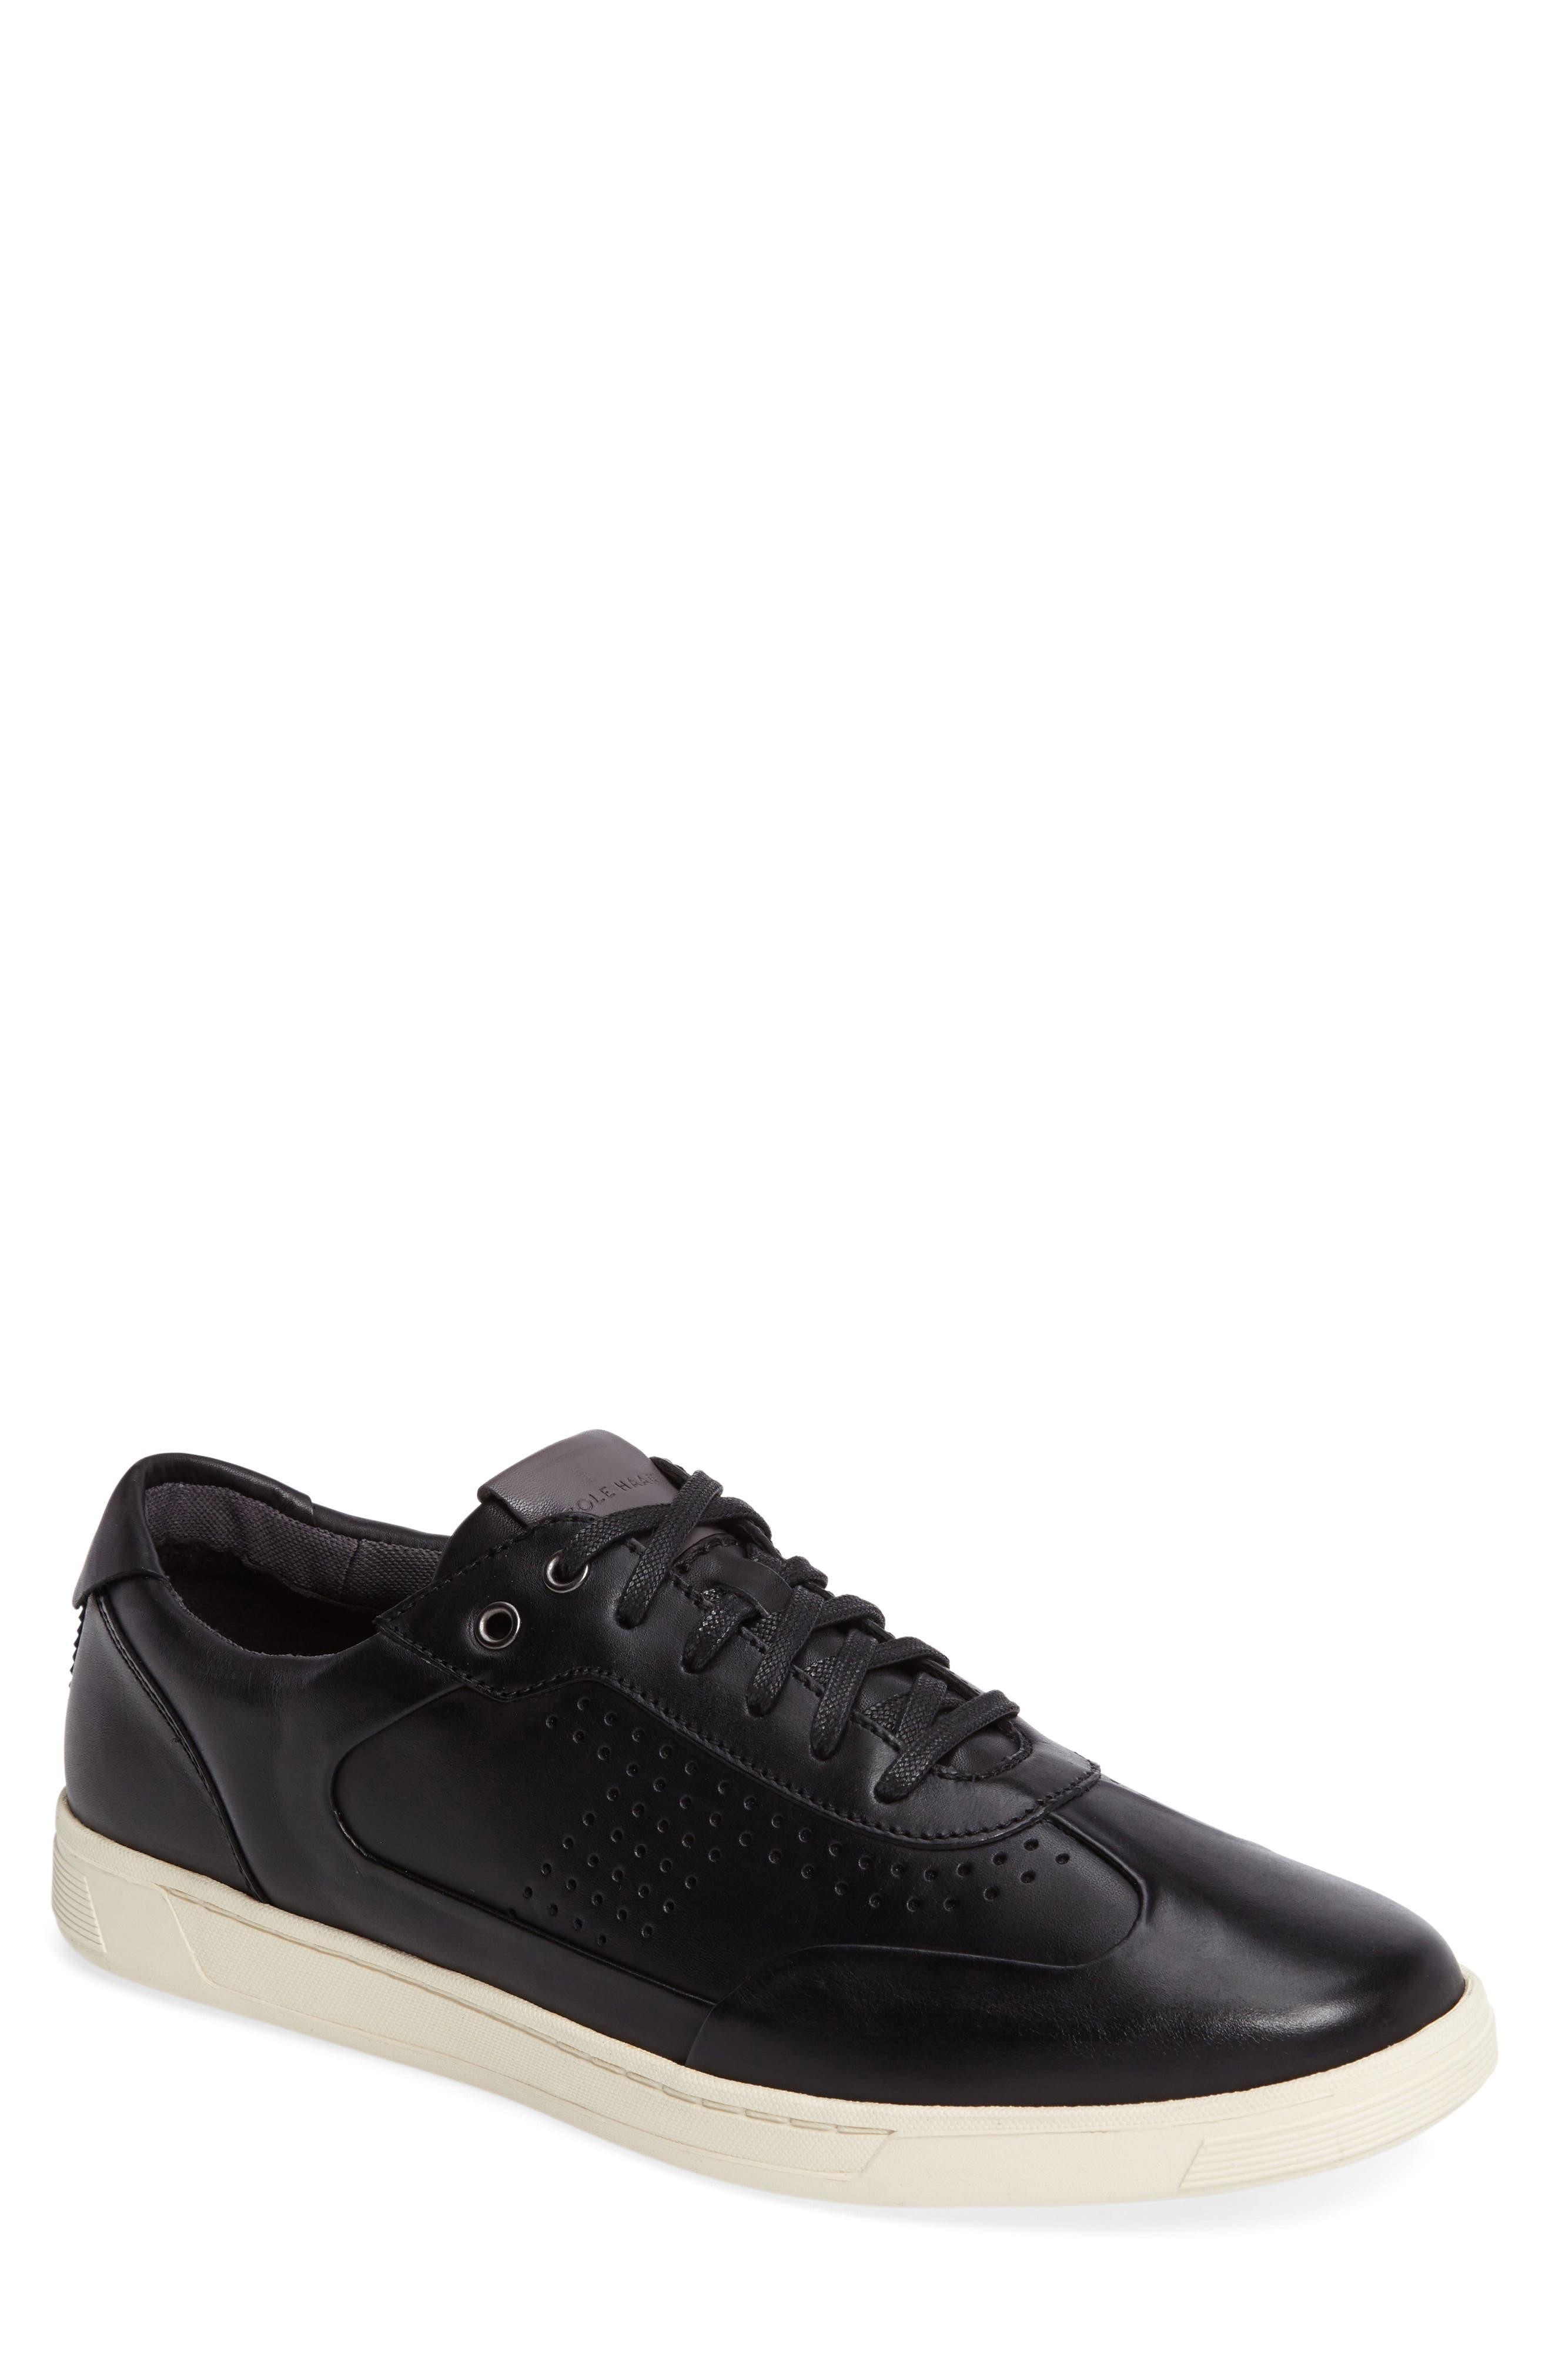 'Vartan Sport Oxford' Sneaker,                             Main thumbnail 5, color,